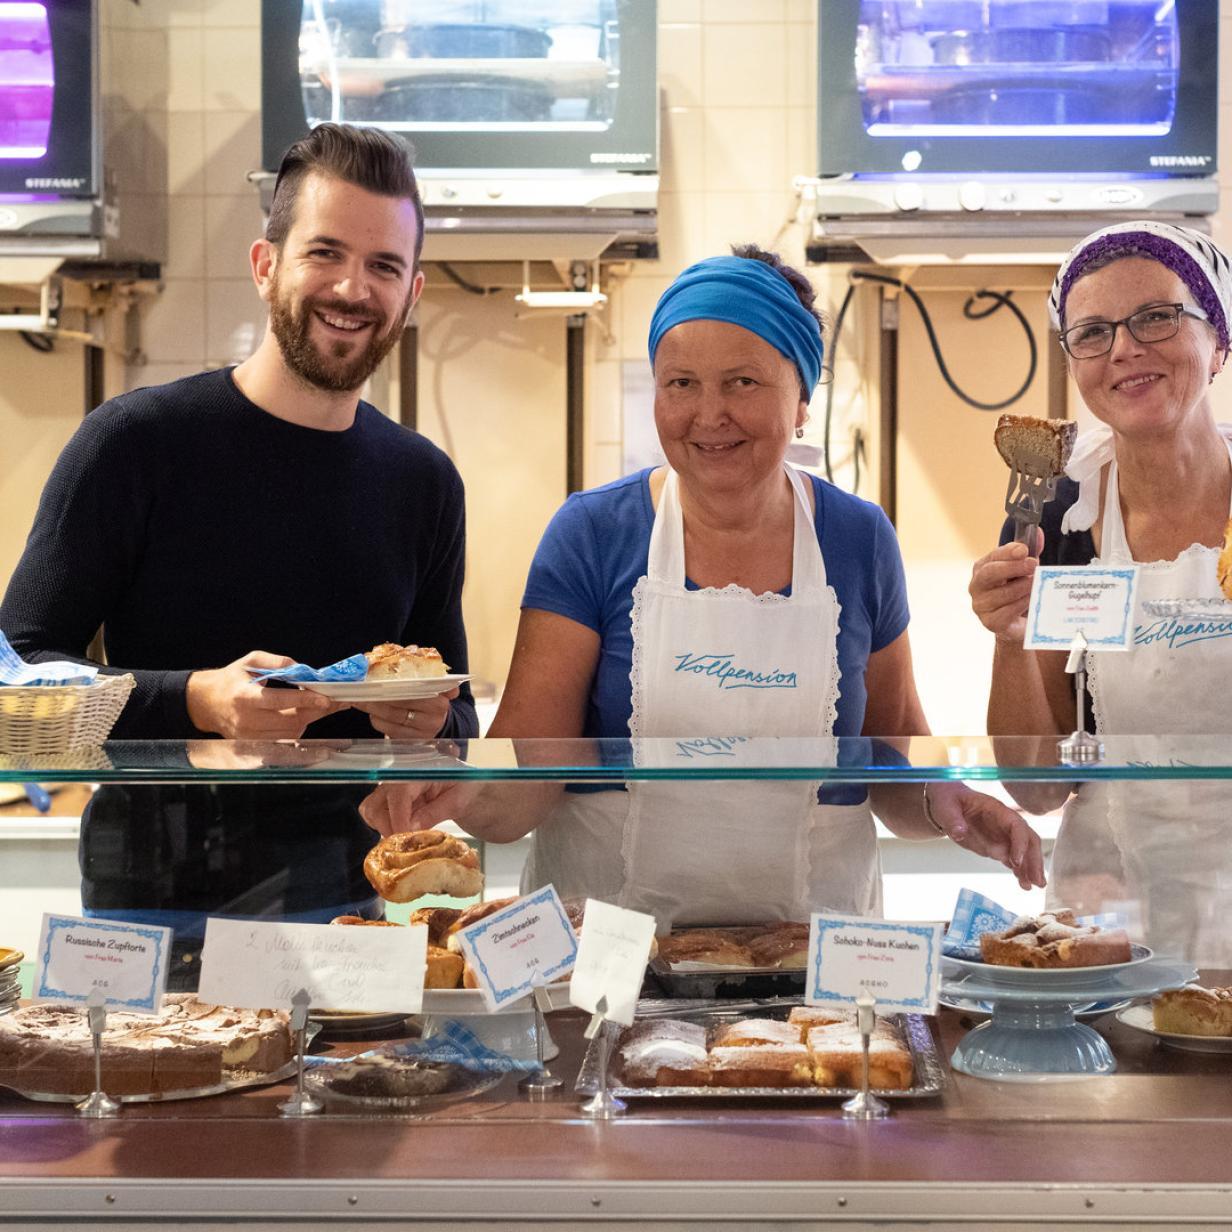 Vollpension: Omas Kuchen als Erfolgsrezept